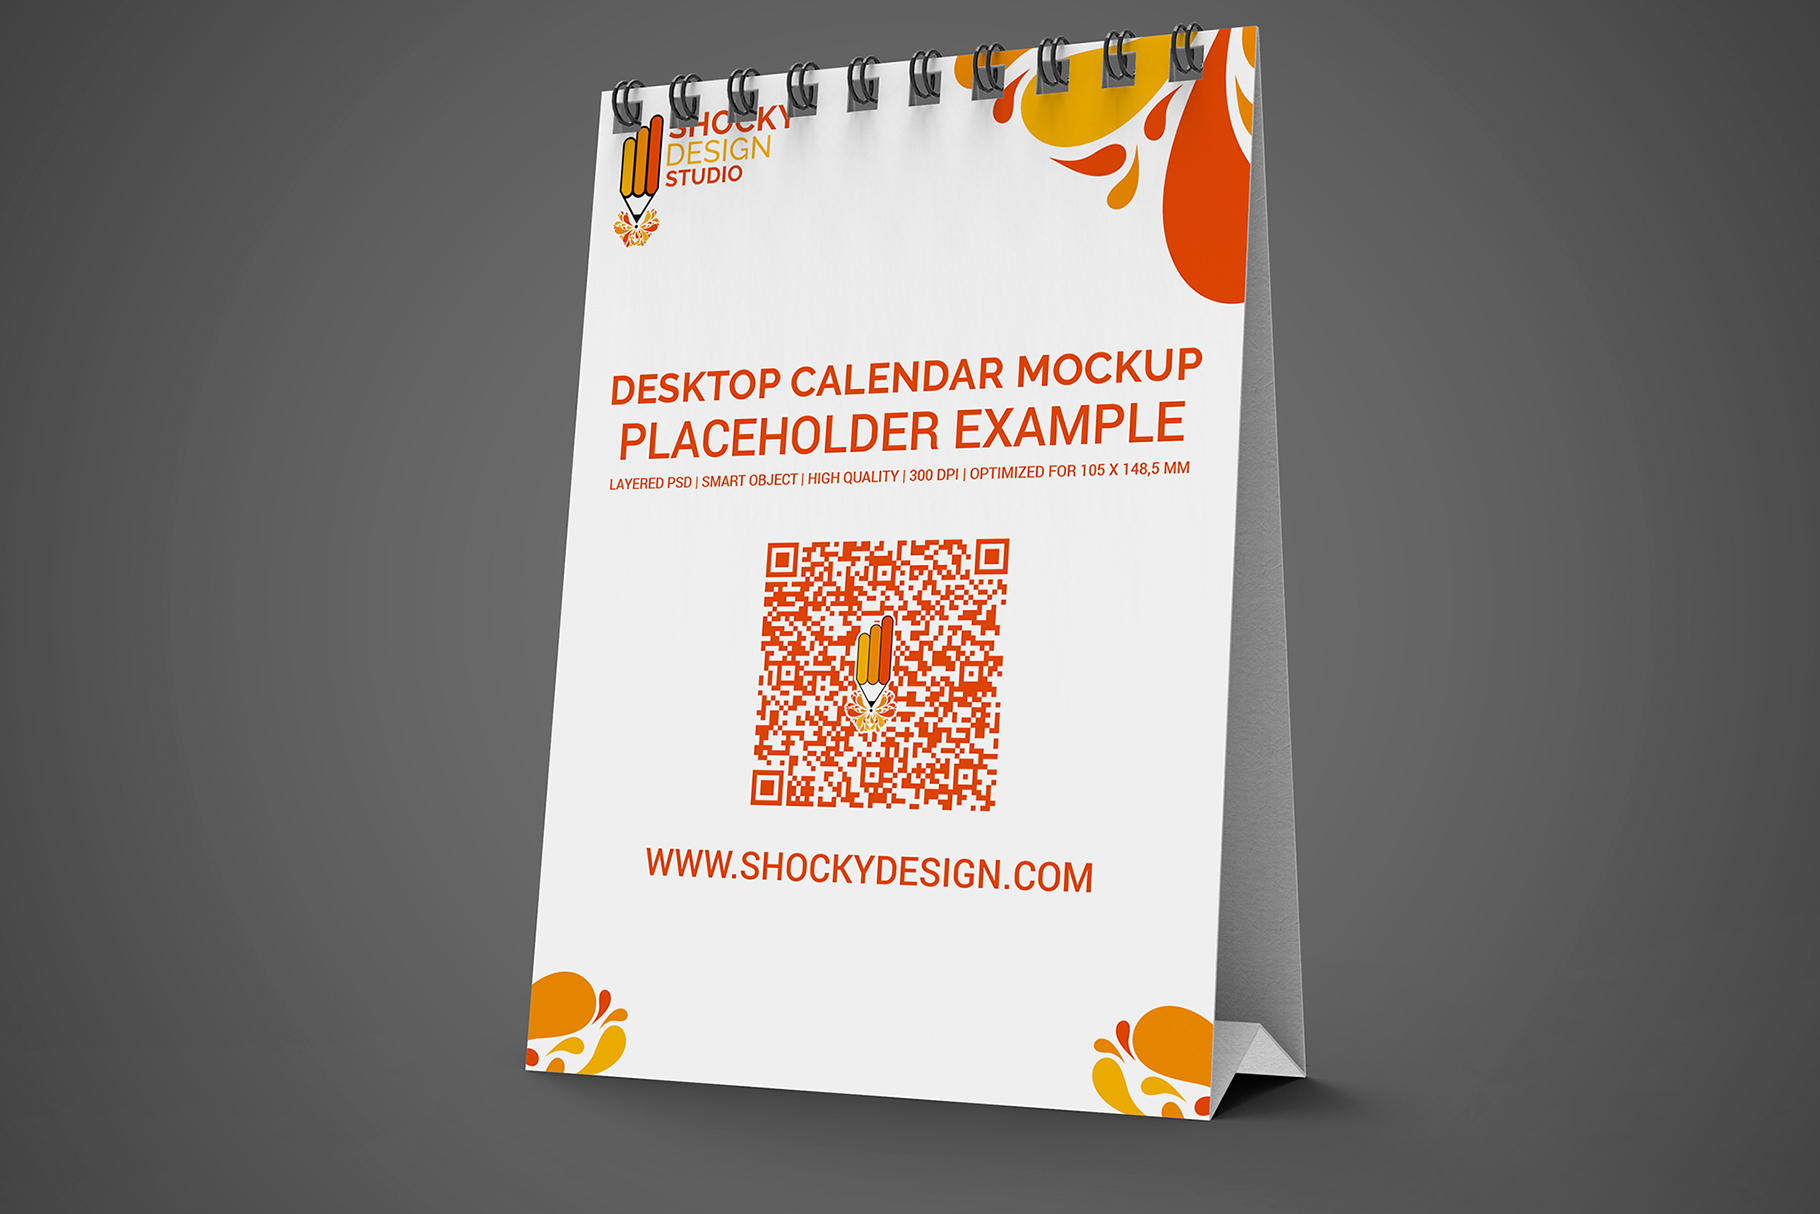 Desktop Calendar A6 Mockup example image 5